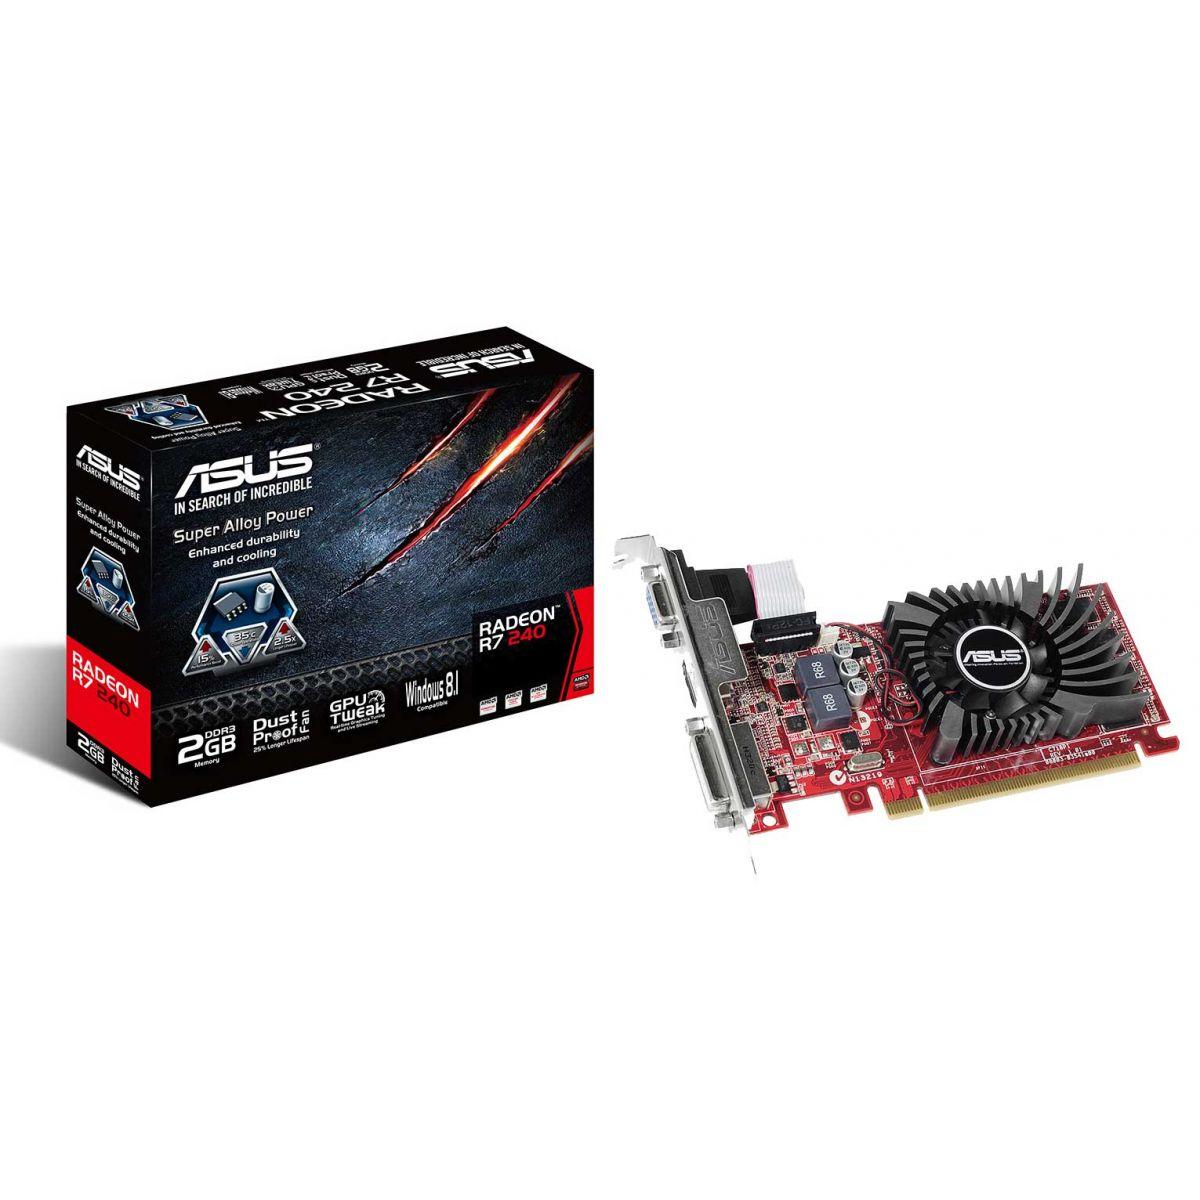 Placa de Vídeo Radeon R7 240 2GB DDR3 128Bit R7240-2GD3-L - Asus